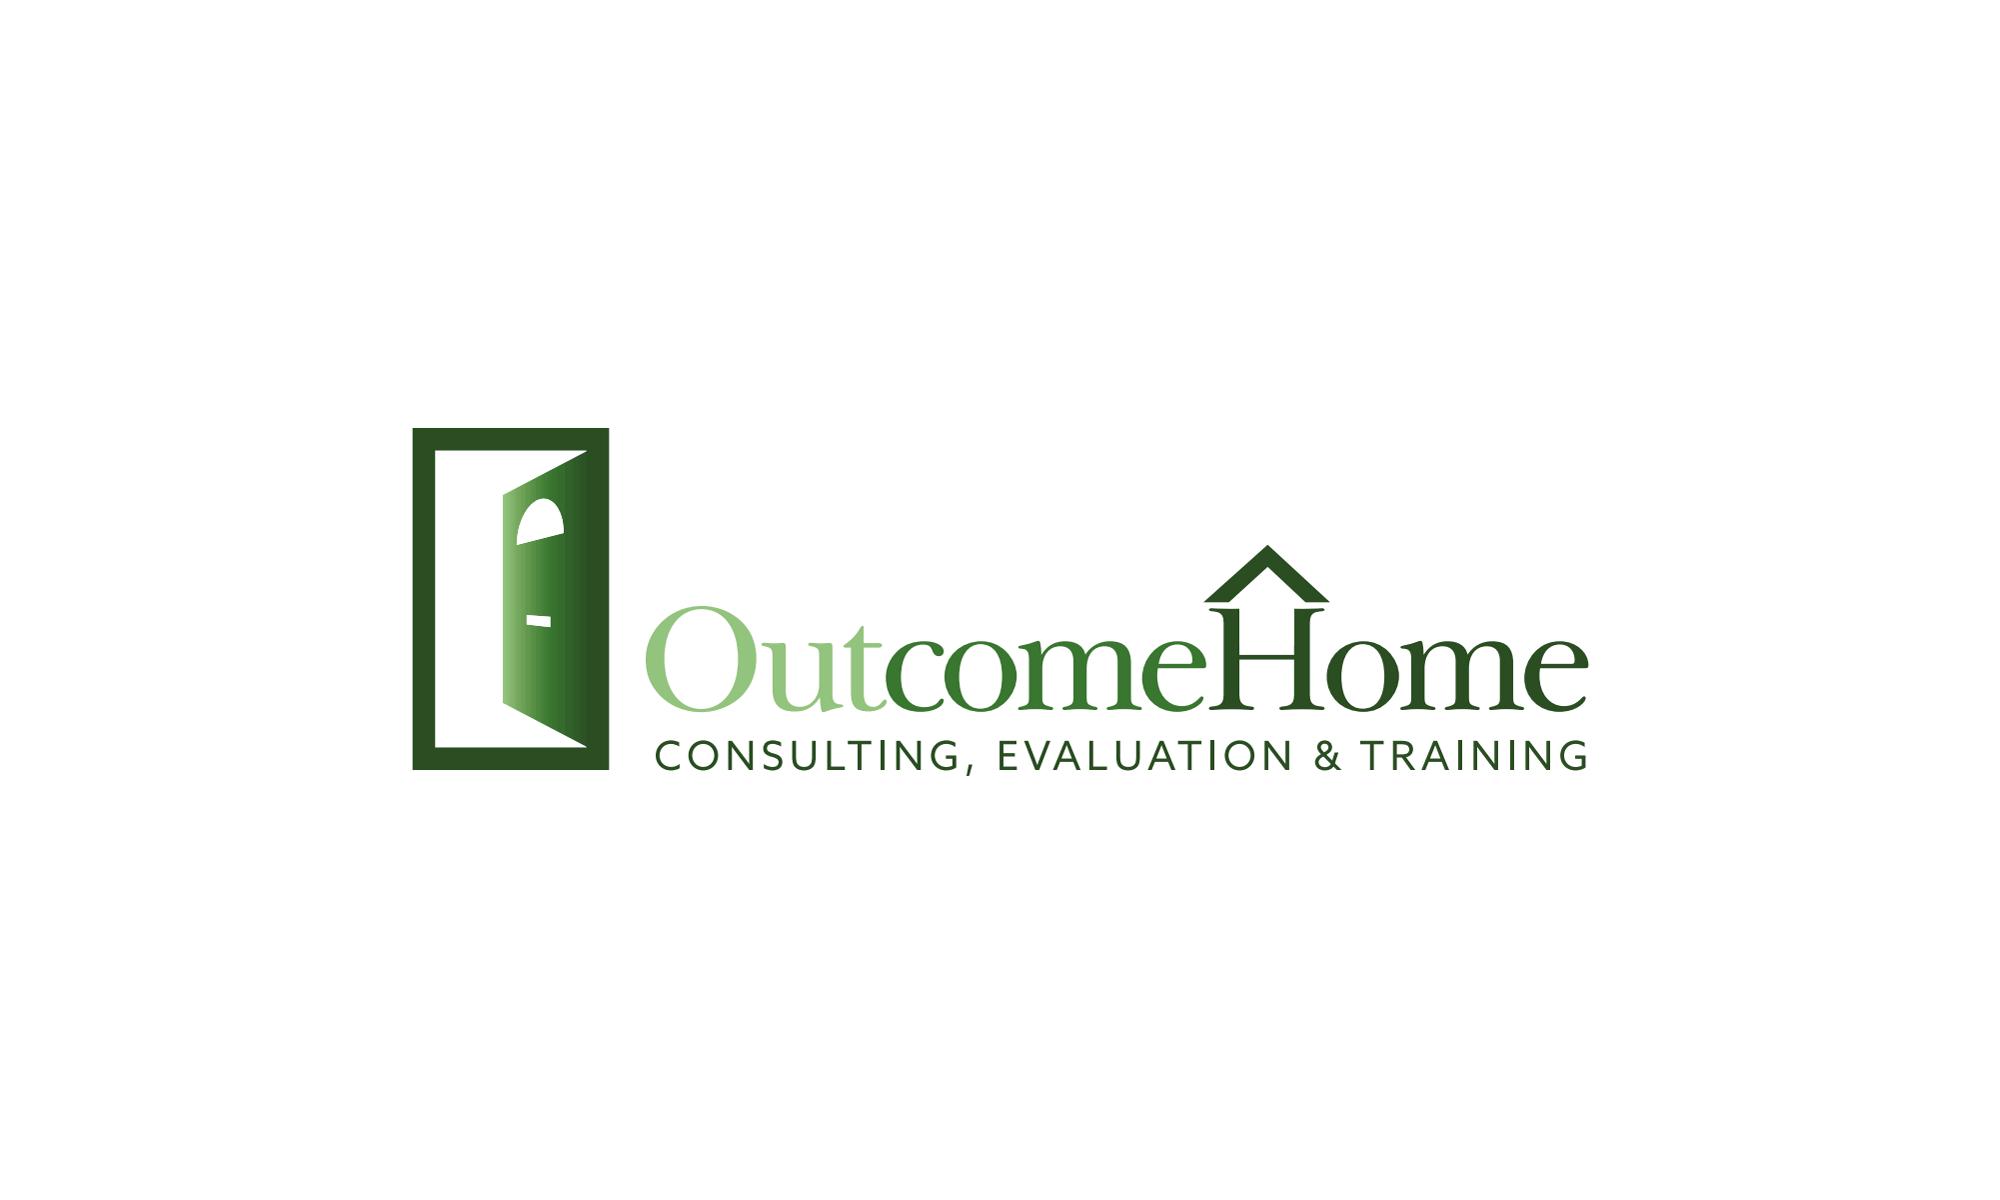 OutcomeHome